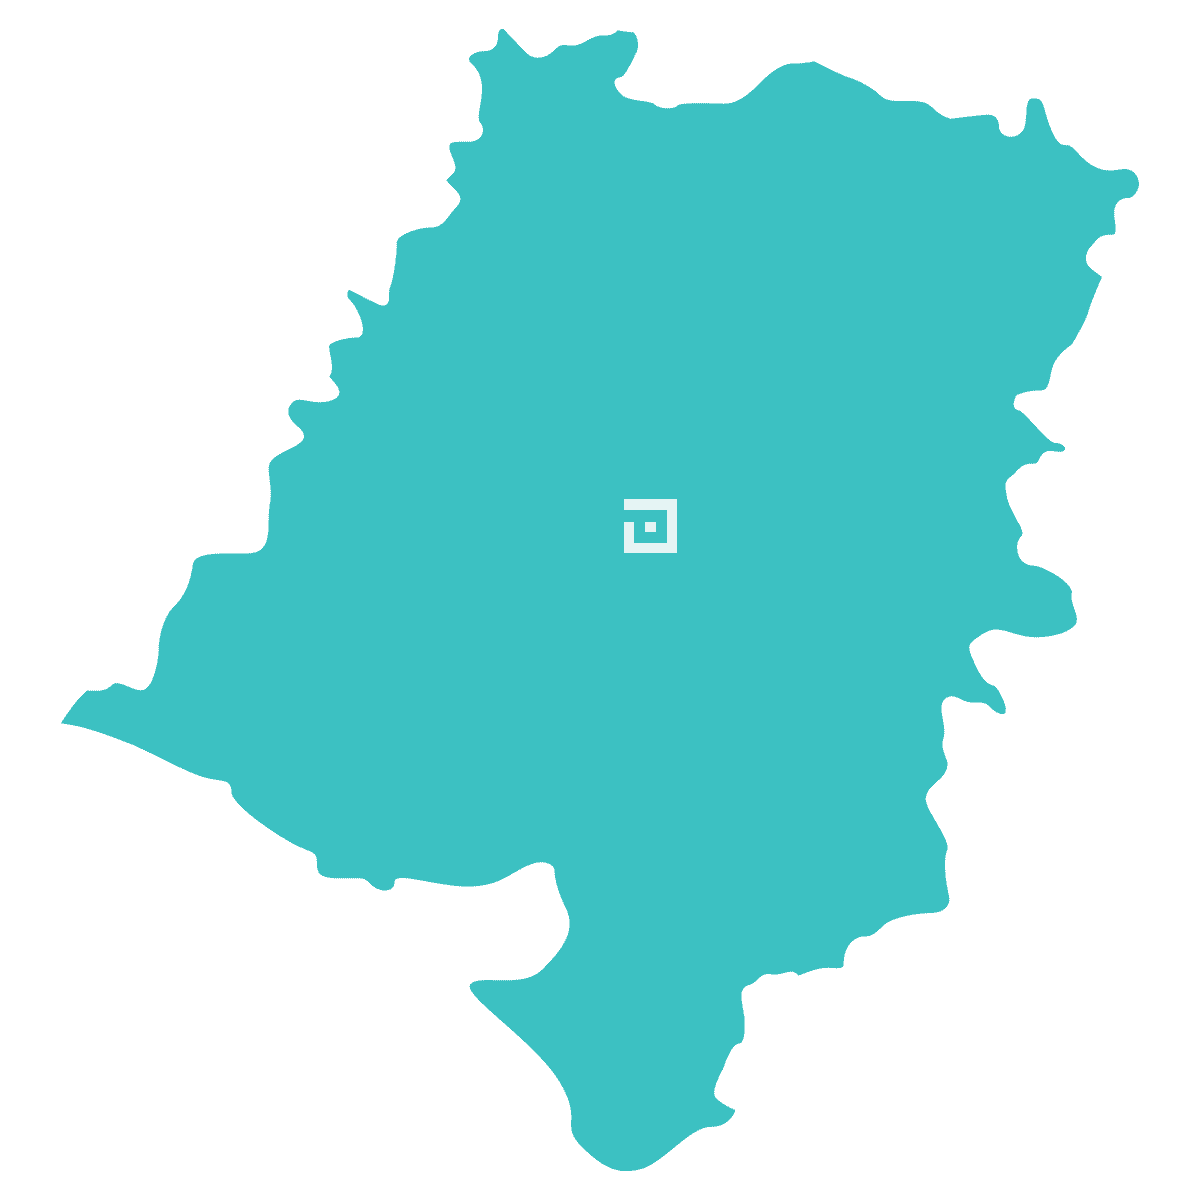 erato-fotowoltaika-opolskie-mapa